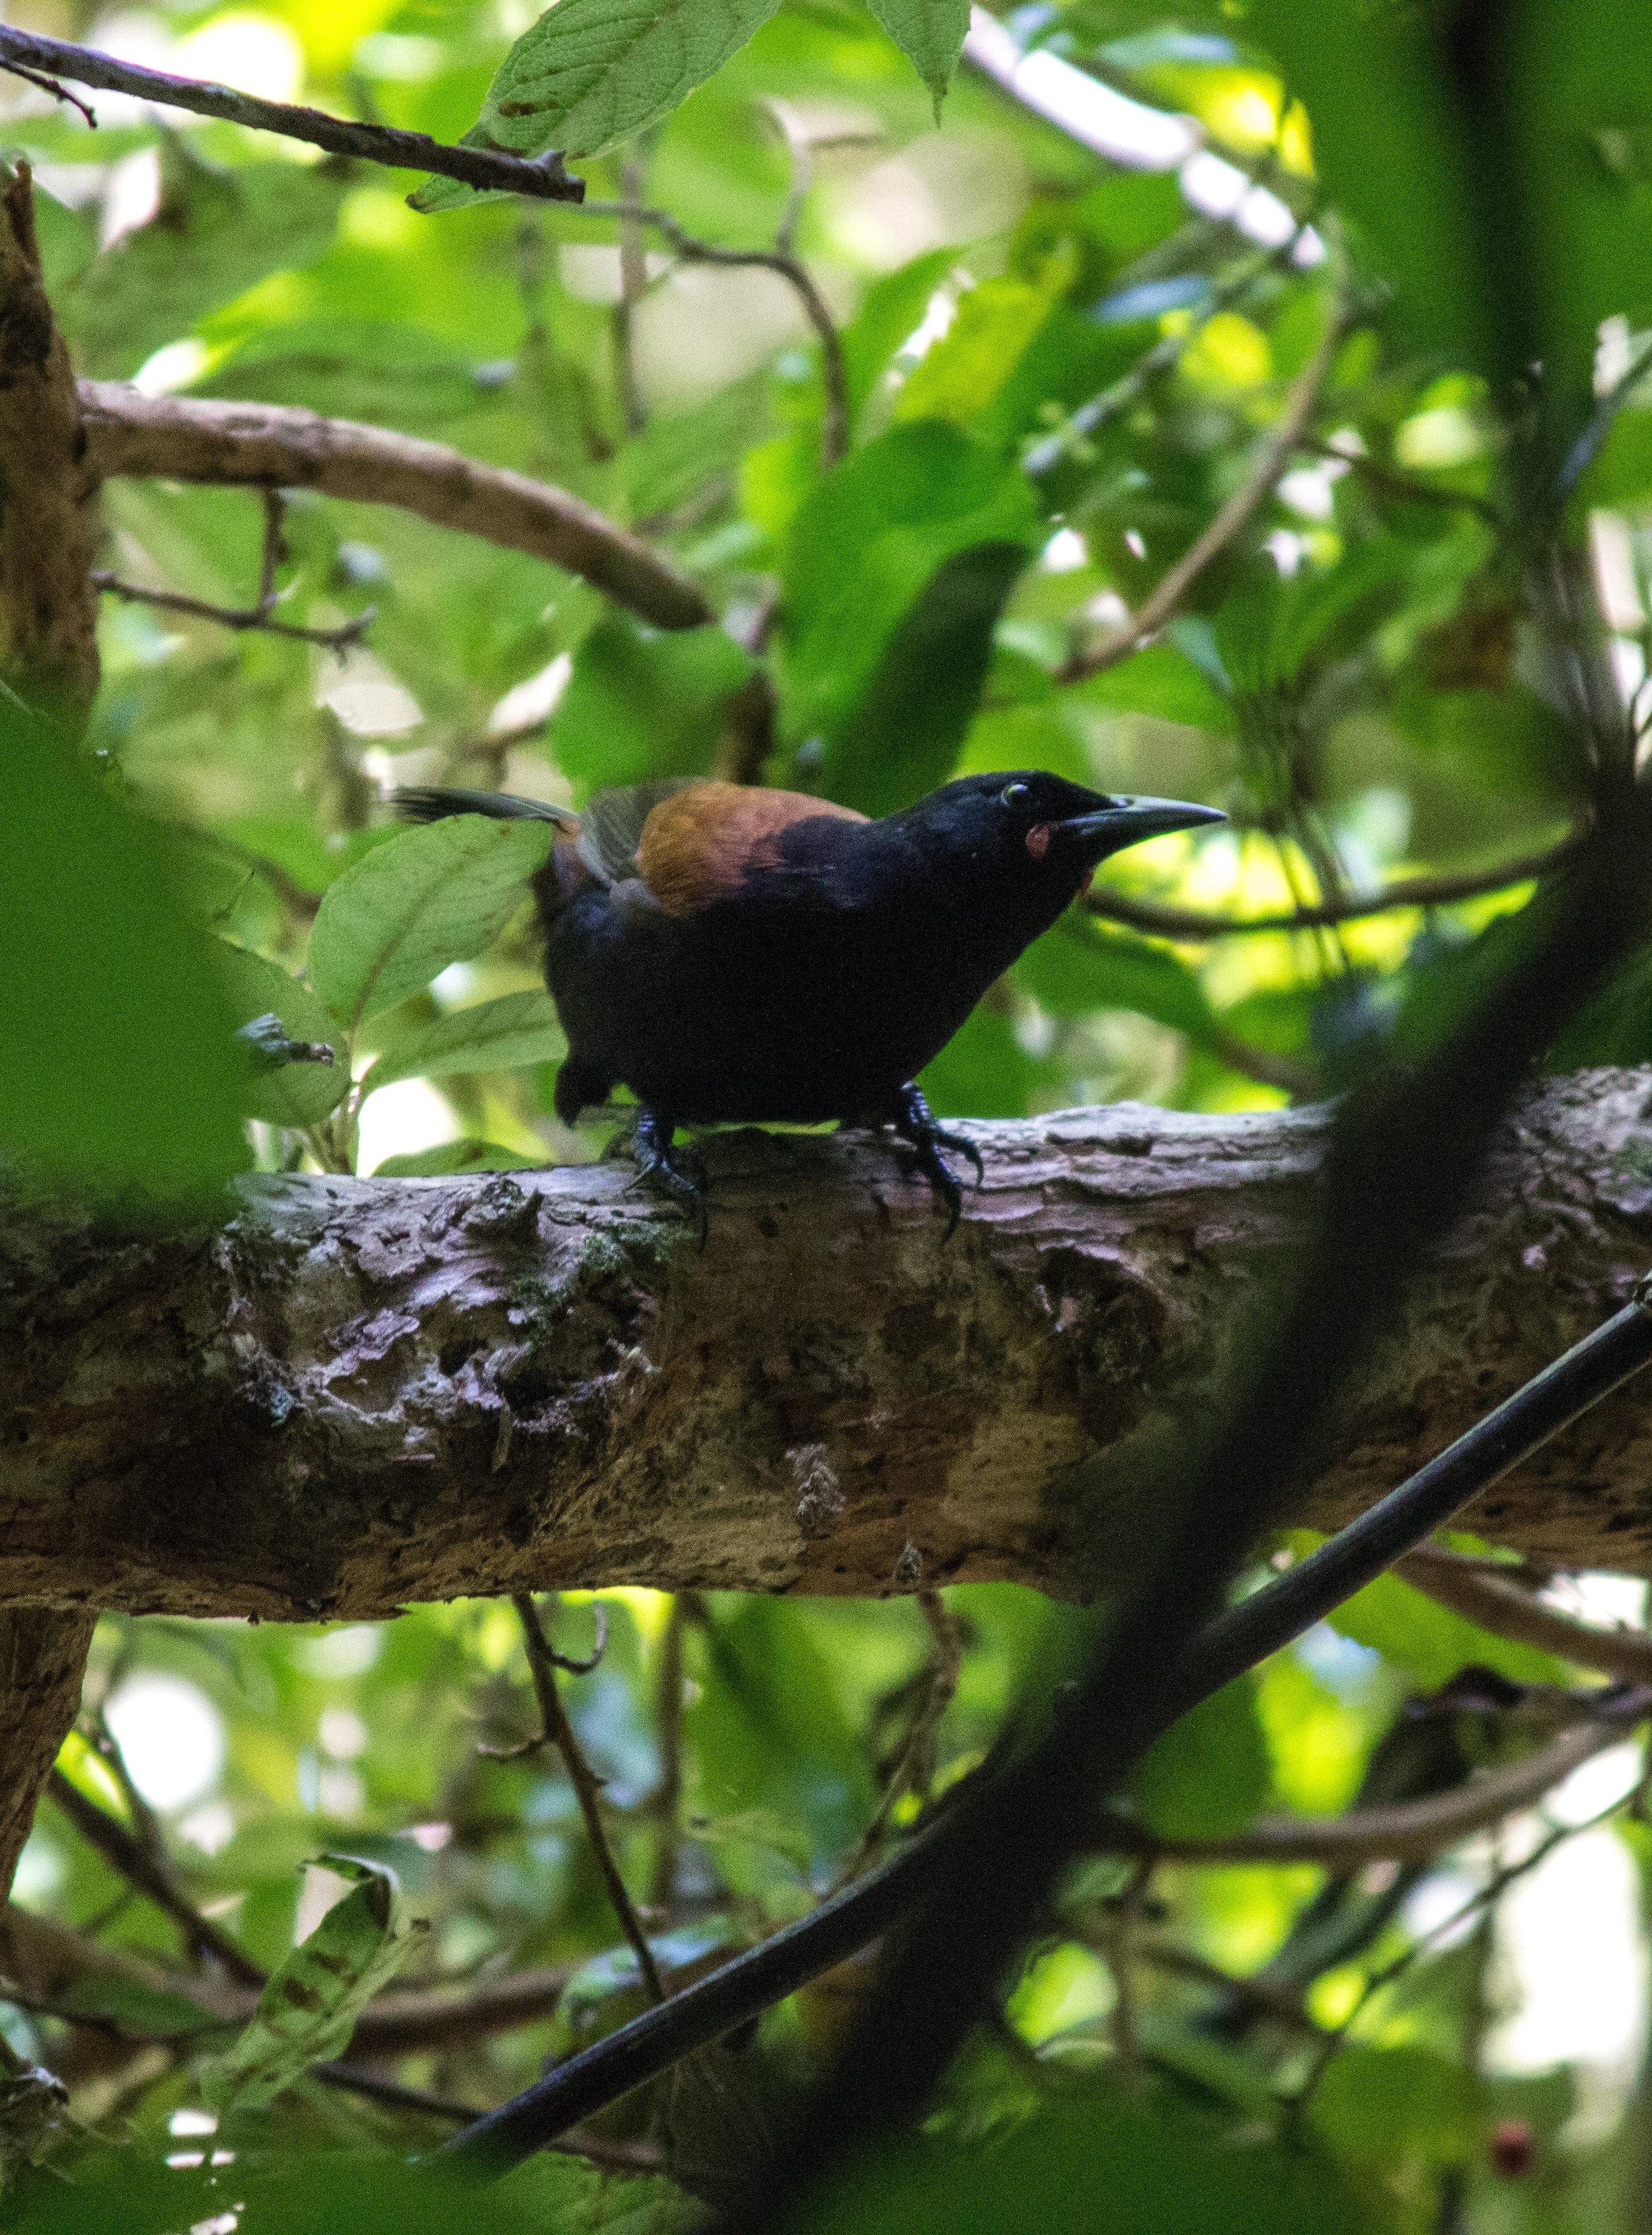 Wattlebird in Zealandia, an endemic forest bird representative of the unique biodiversity that remains. Wellington, New Zealand.